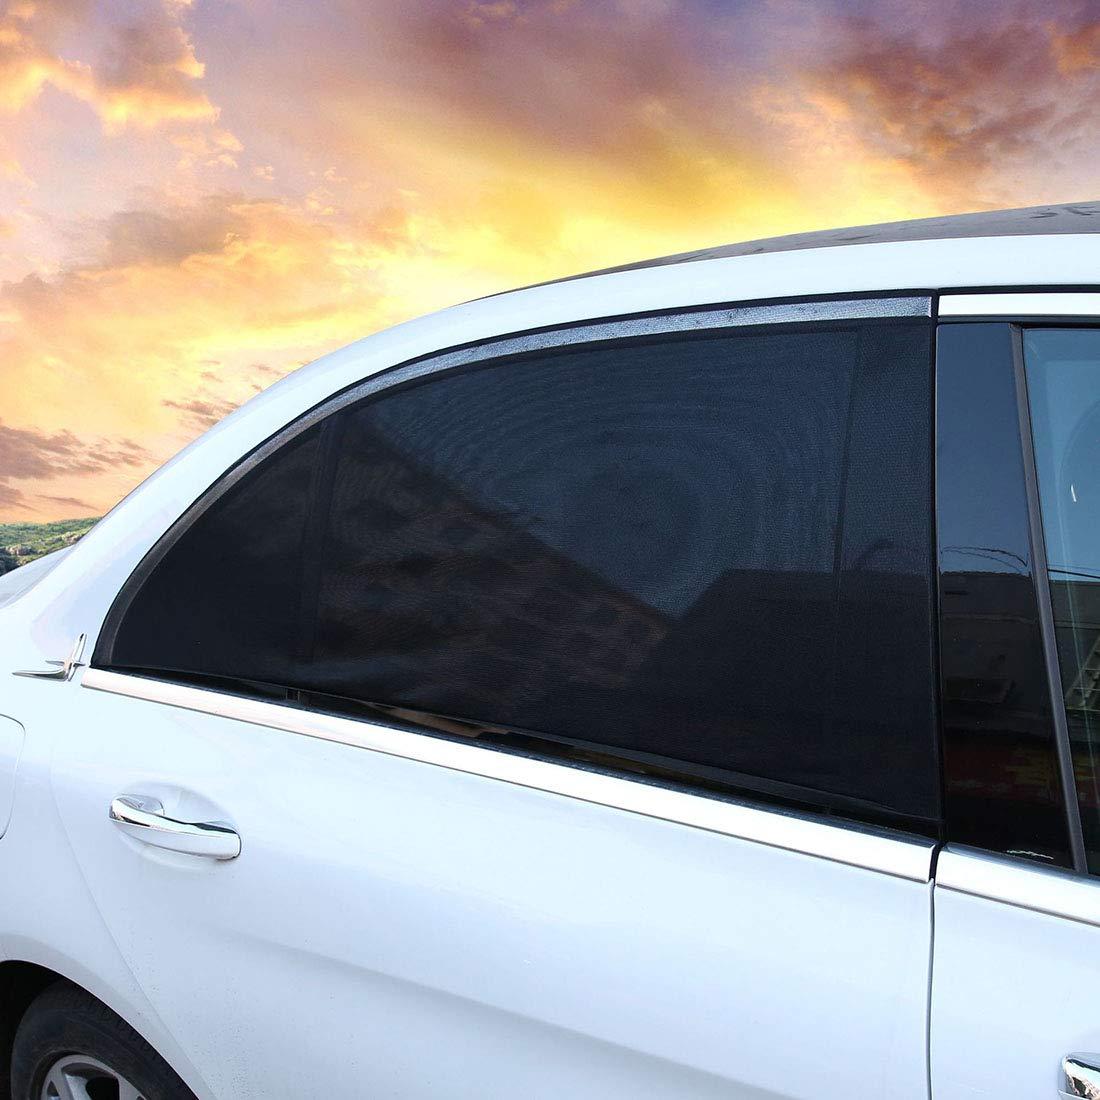 Freahap Car Window Shade 2Pcs Slip-on Mesh Sunshade for Car Side Windows Car Sun Shades